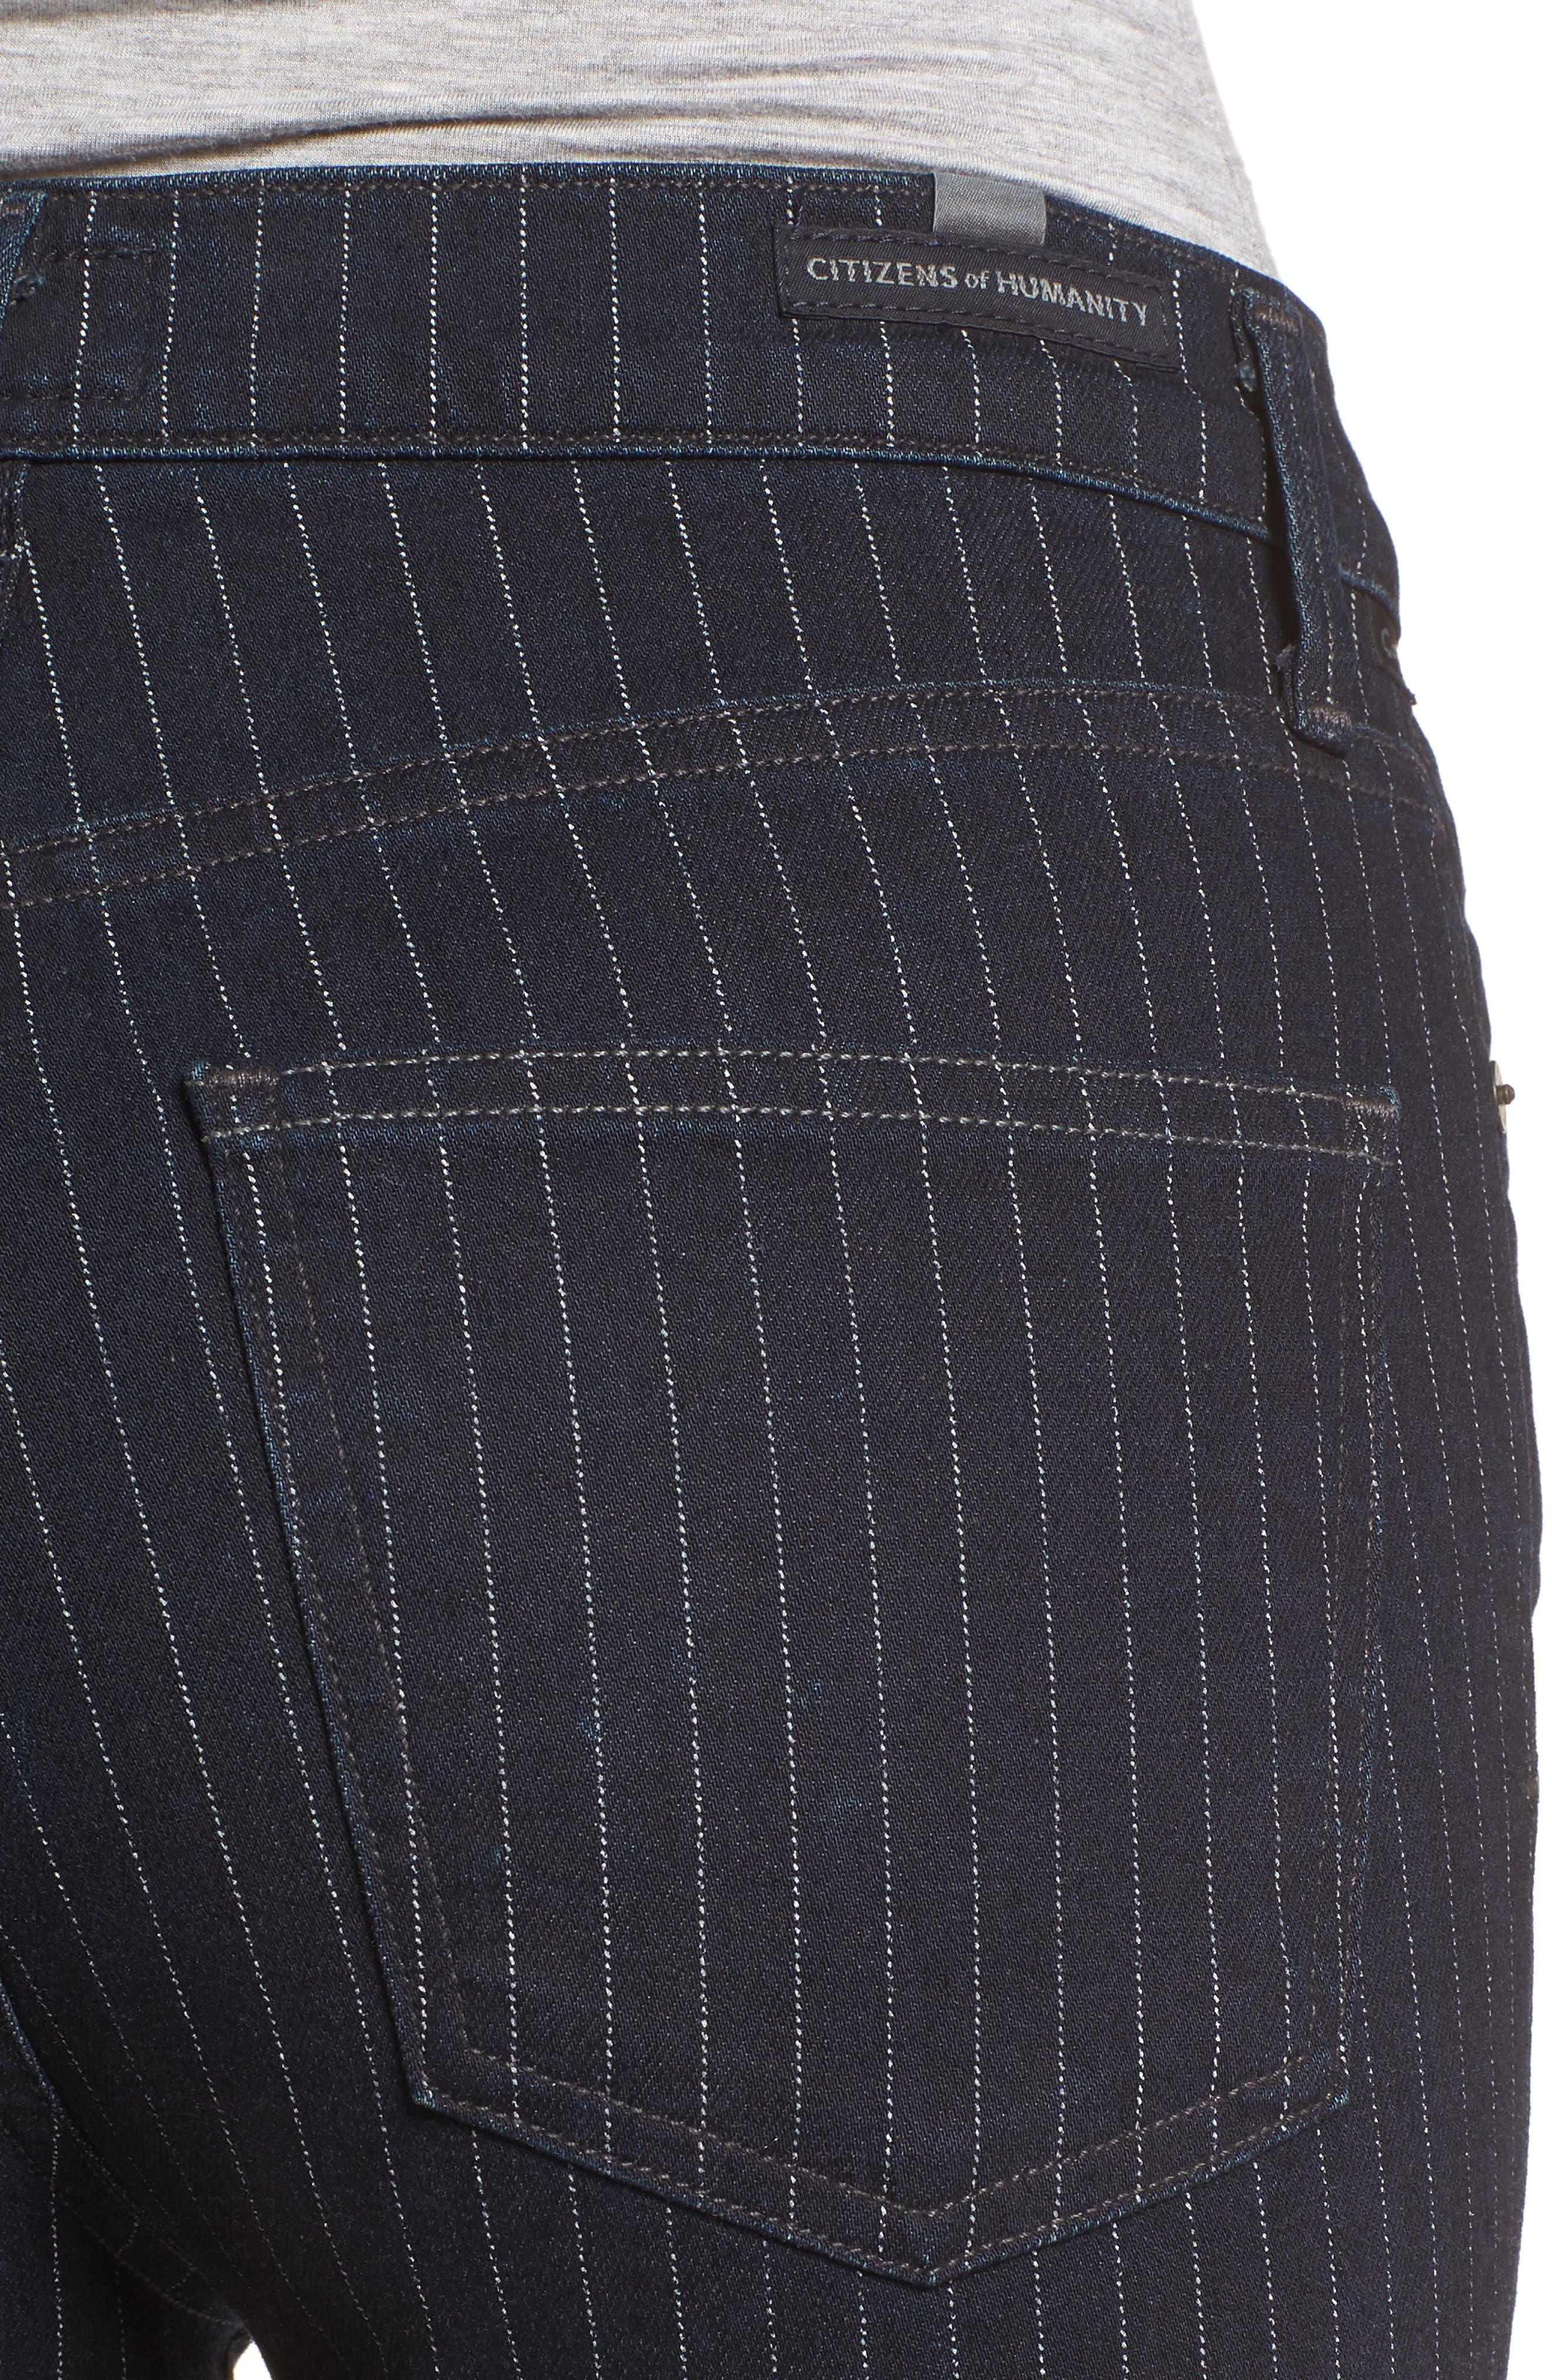 Rocket High Waist Crop Skinny Jeans,                             Alternate thumbnail 4, color,                             Pinstripe